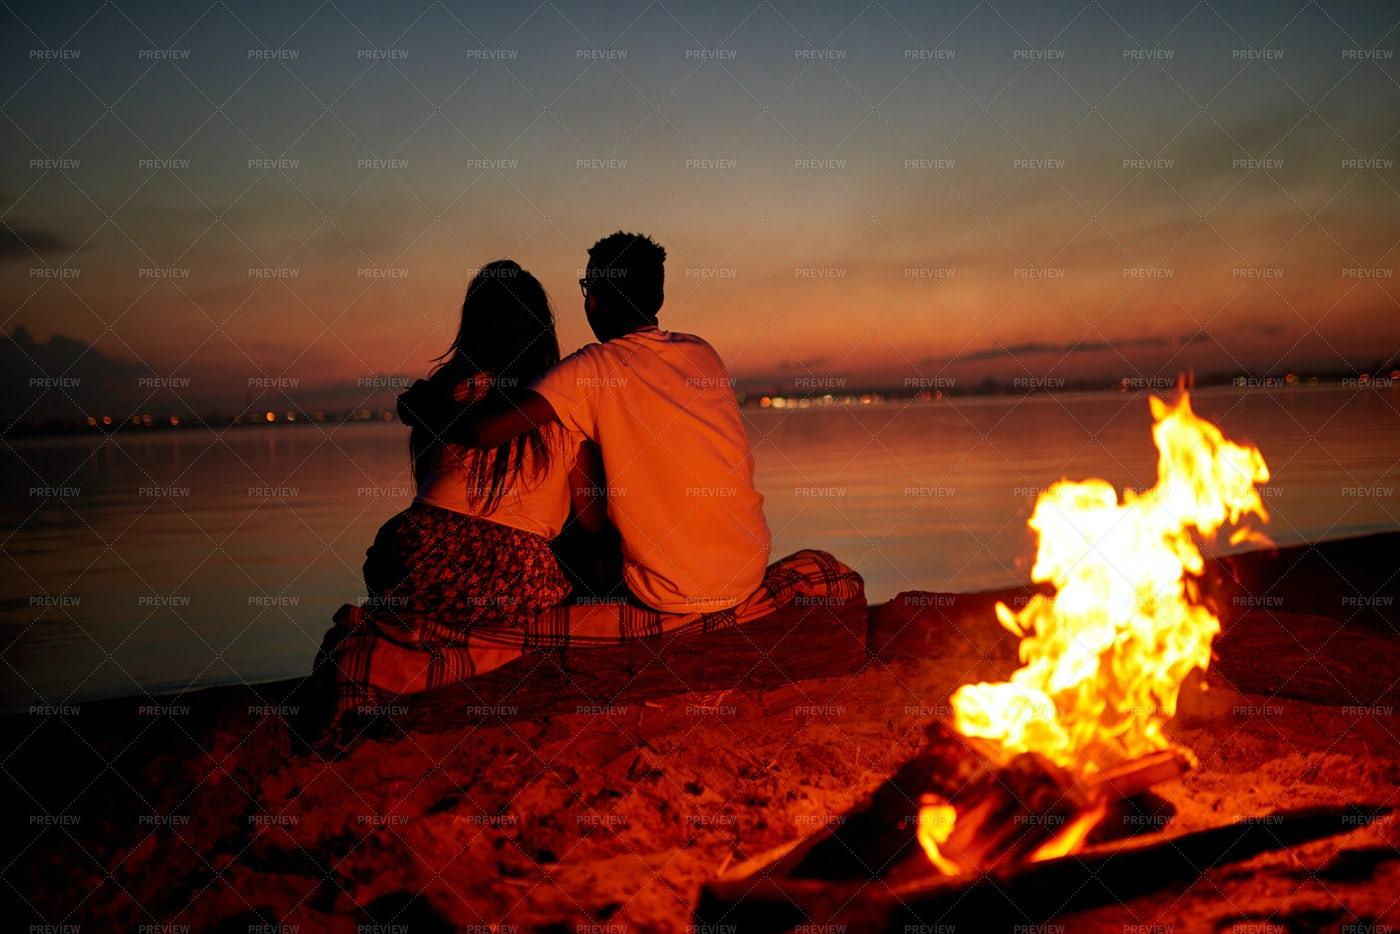 Romantic Date On Beach At Night: Stock Photos